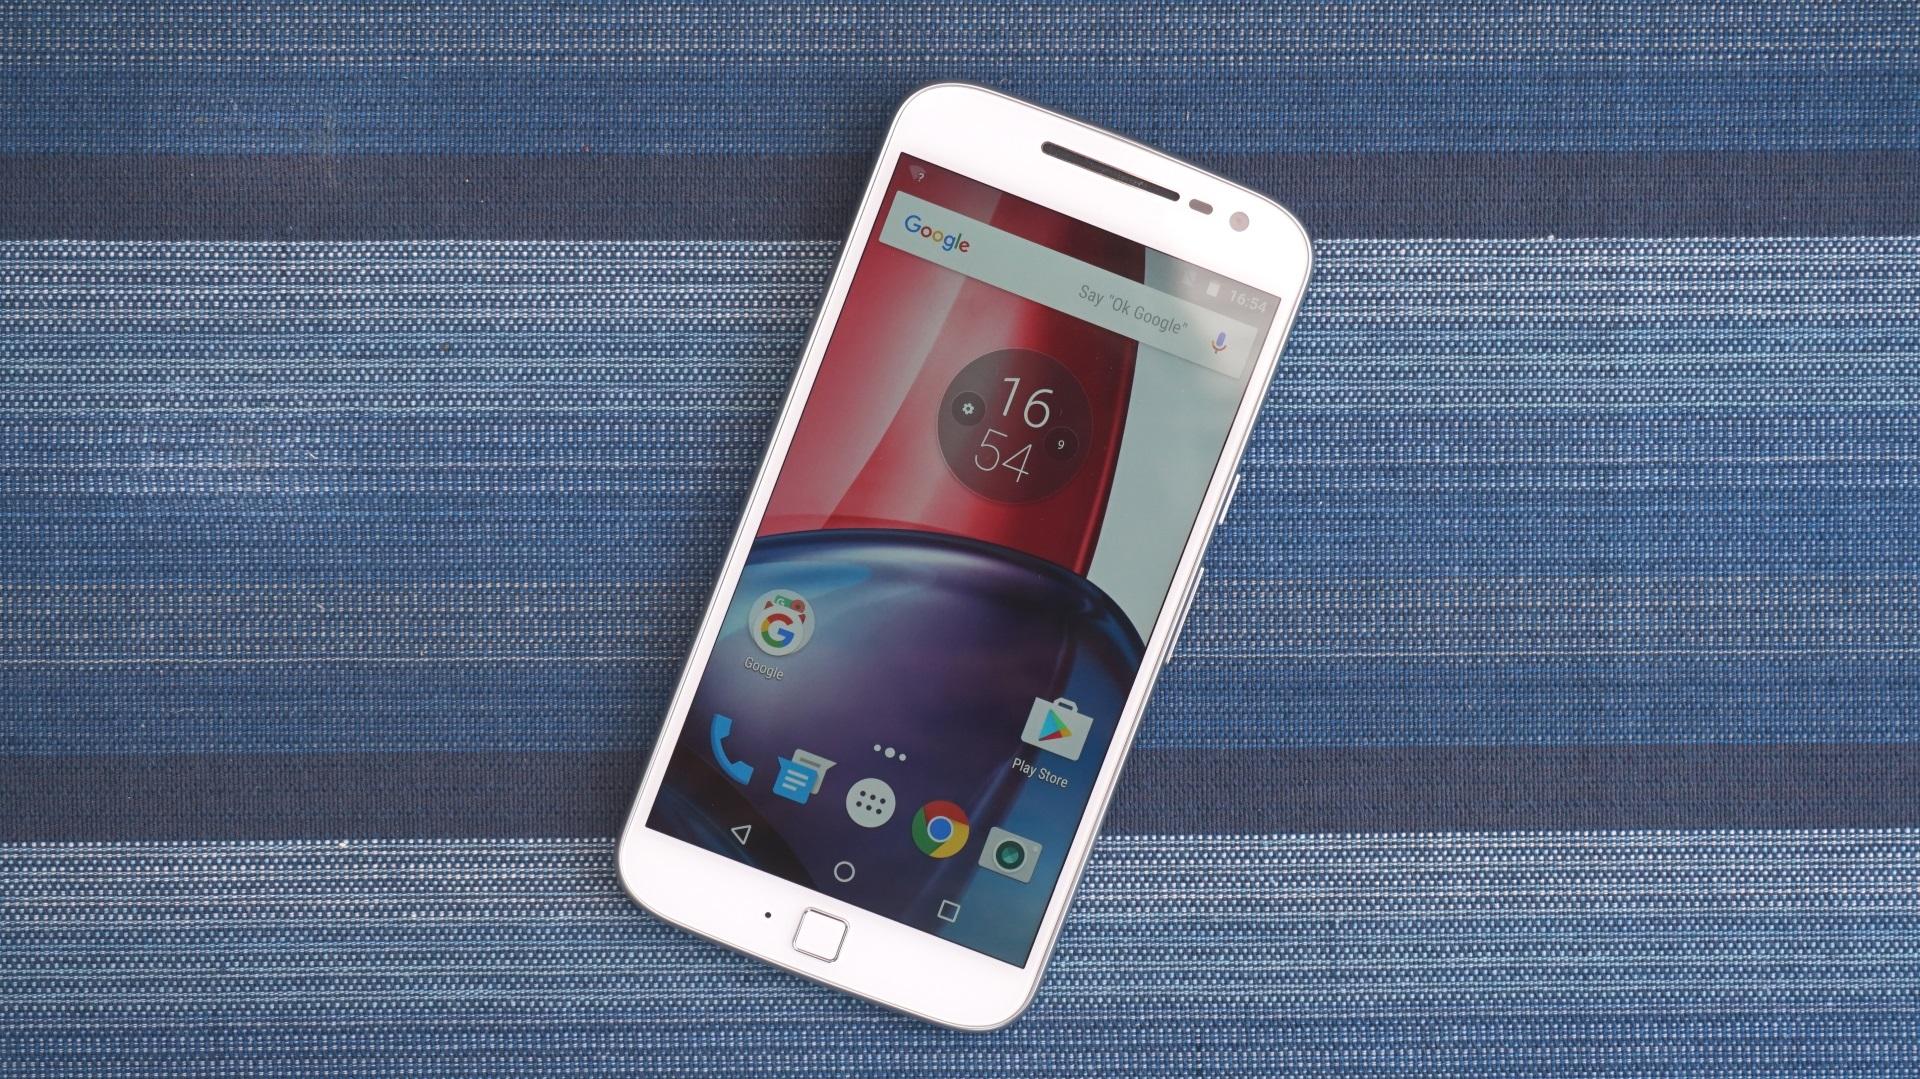 Motorola Moto G4 Plus review: Should you buy a Moto G5 Plus